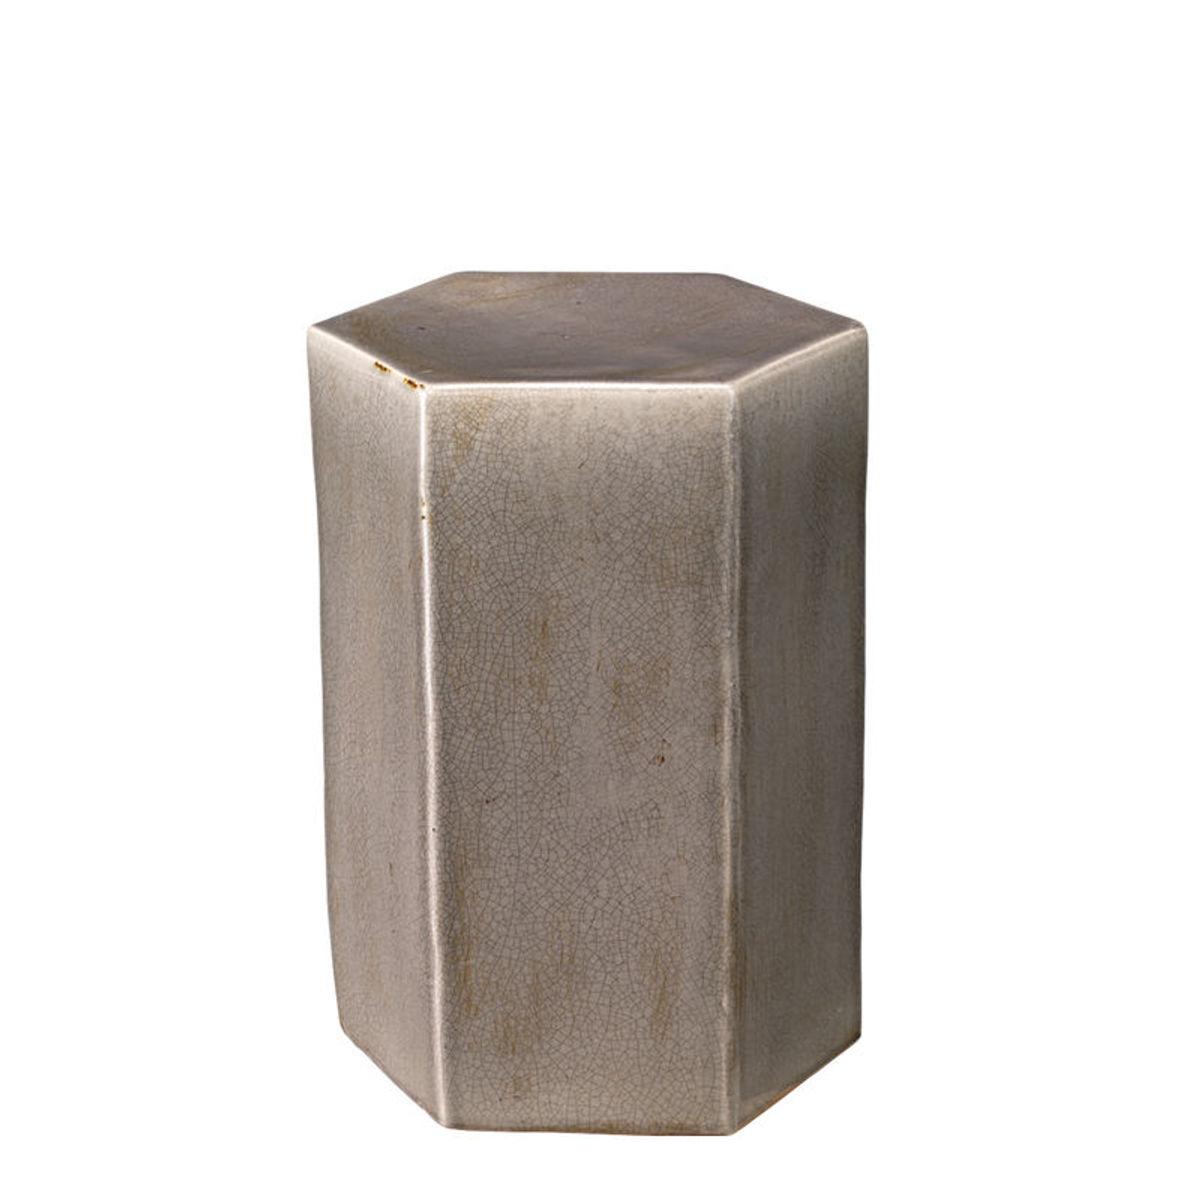 Small Porto Side Table In Grey Ceramic